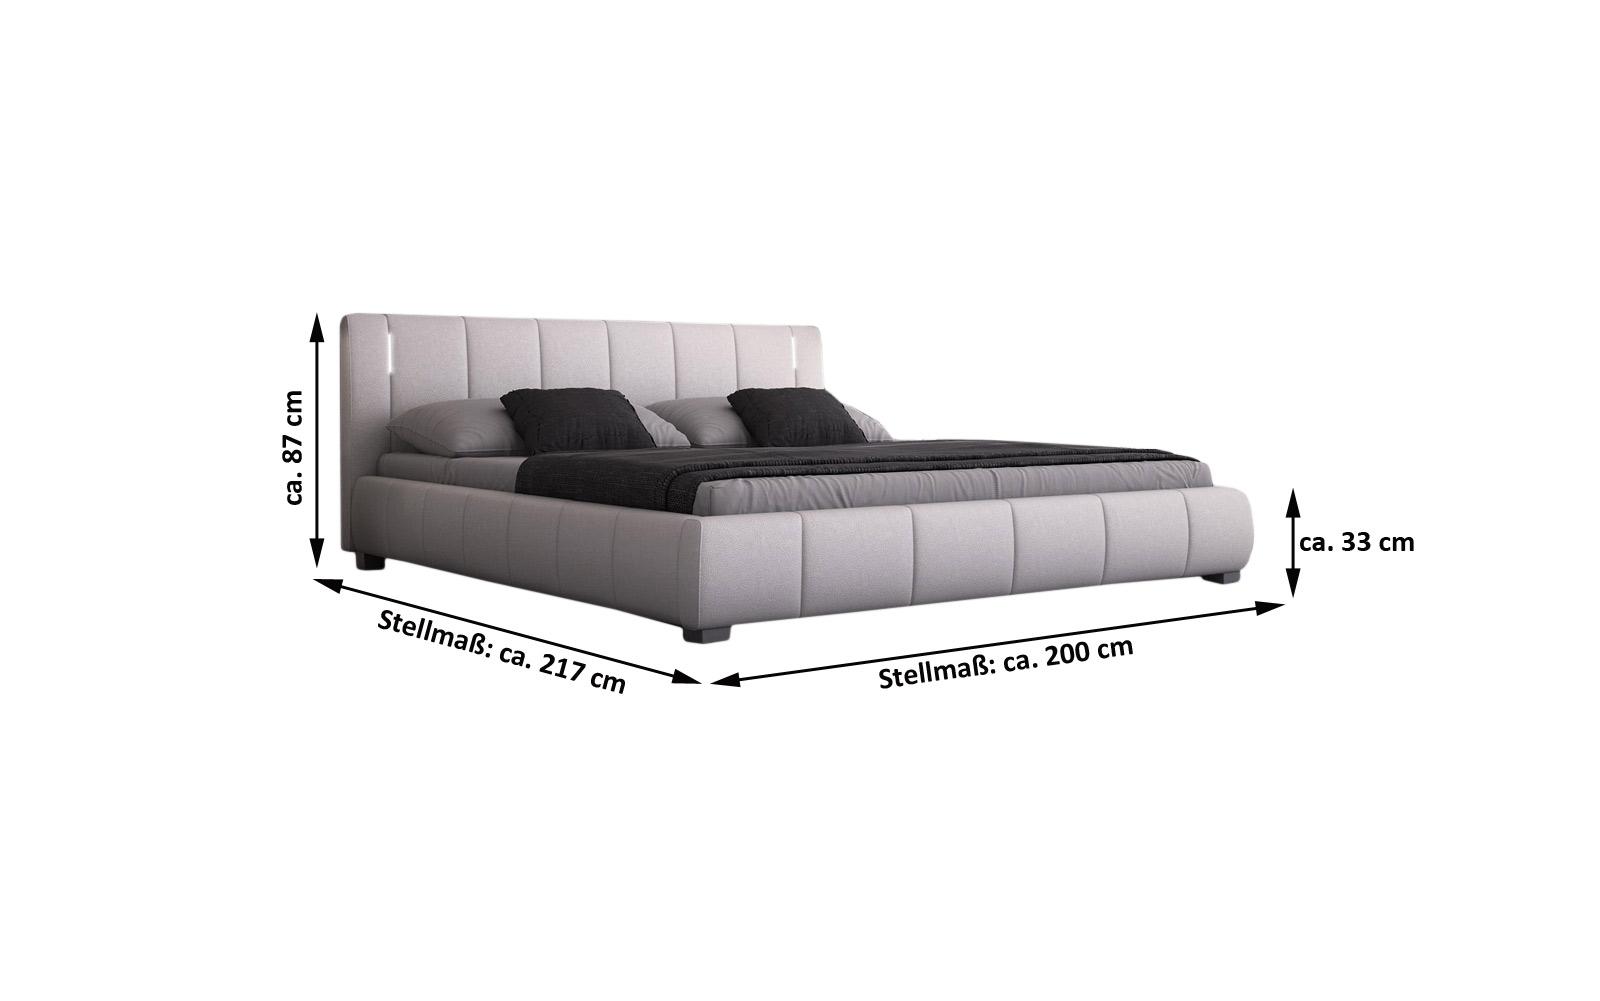 doppelbett 180x200 wei cheap flores doppelbett x weiu eiche with doppelbett 180x200 wei billig. Black Bedroom Furniture Sets. Home Design Ideas